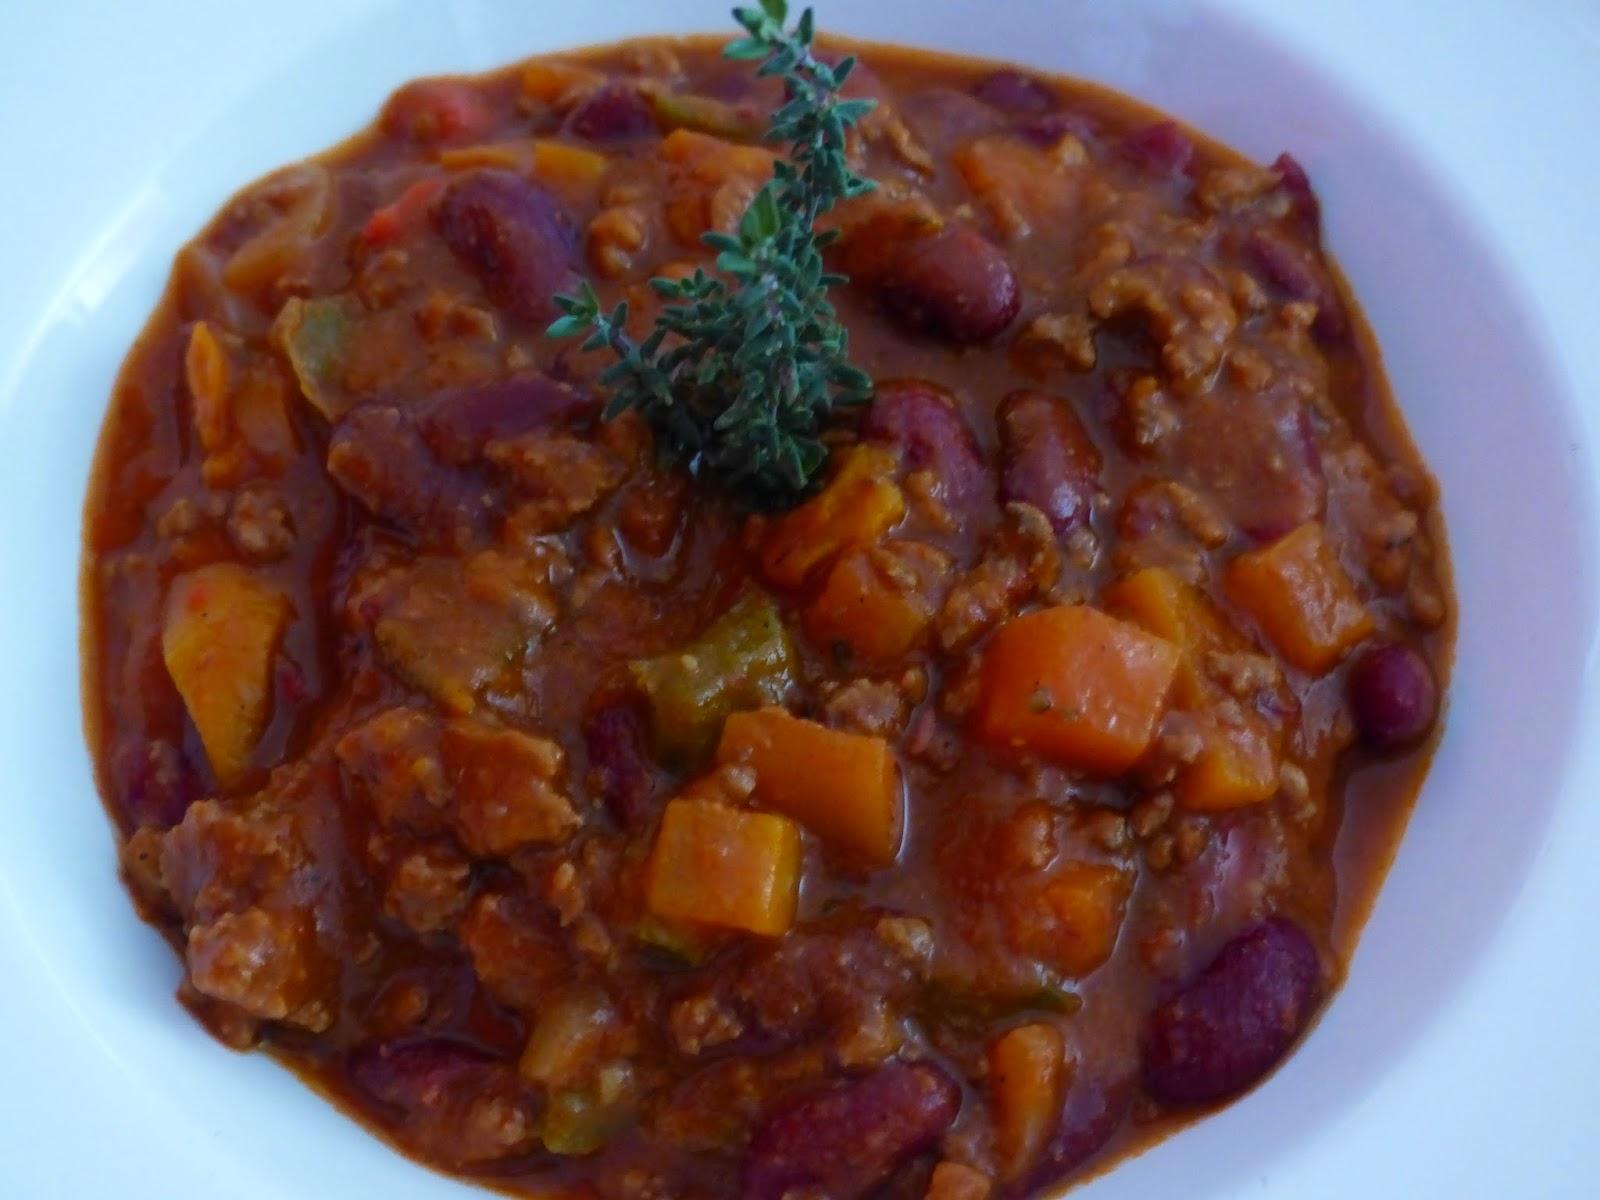 Verboten Gut Chili Con Carne Nach Alfons Schuhbeck